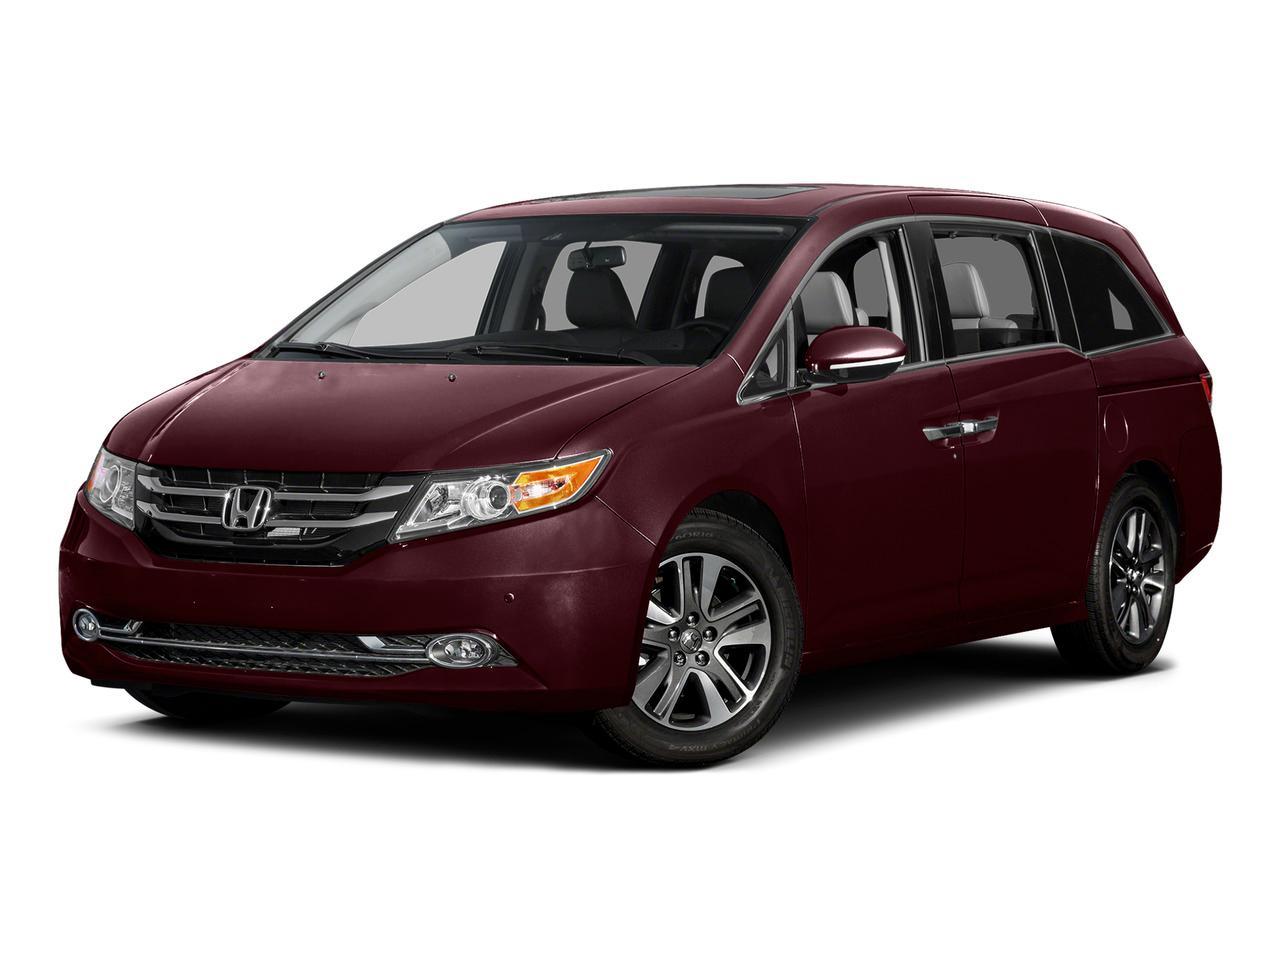 2015 Honda Odyssey Vehicle Photo in Salisbury, MD 21801